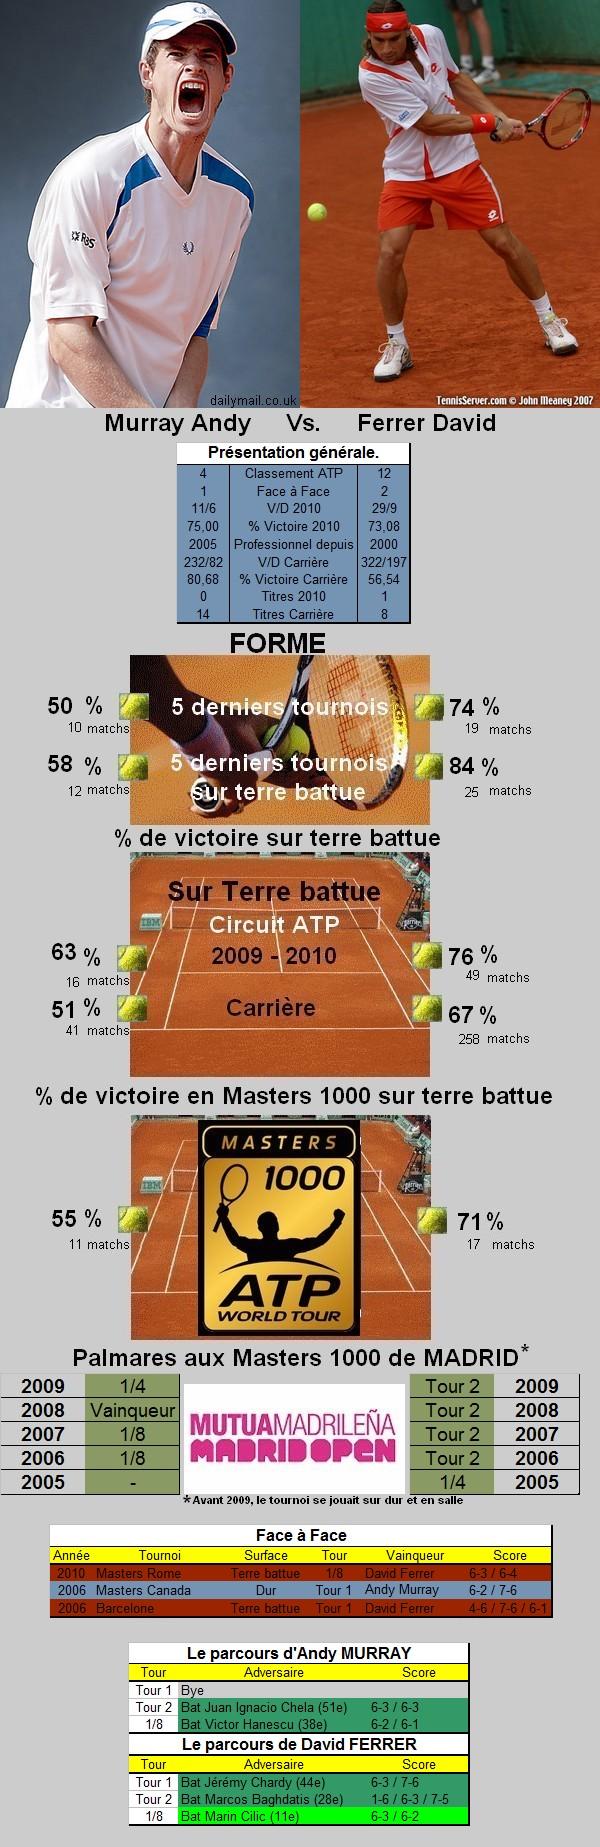 Statistiques tennis de Murray contre Ferrer à Madrid